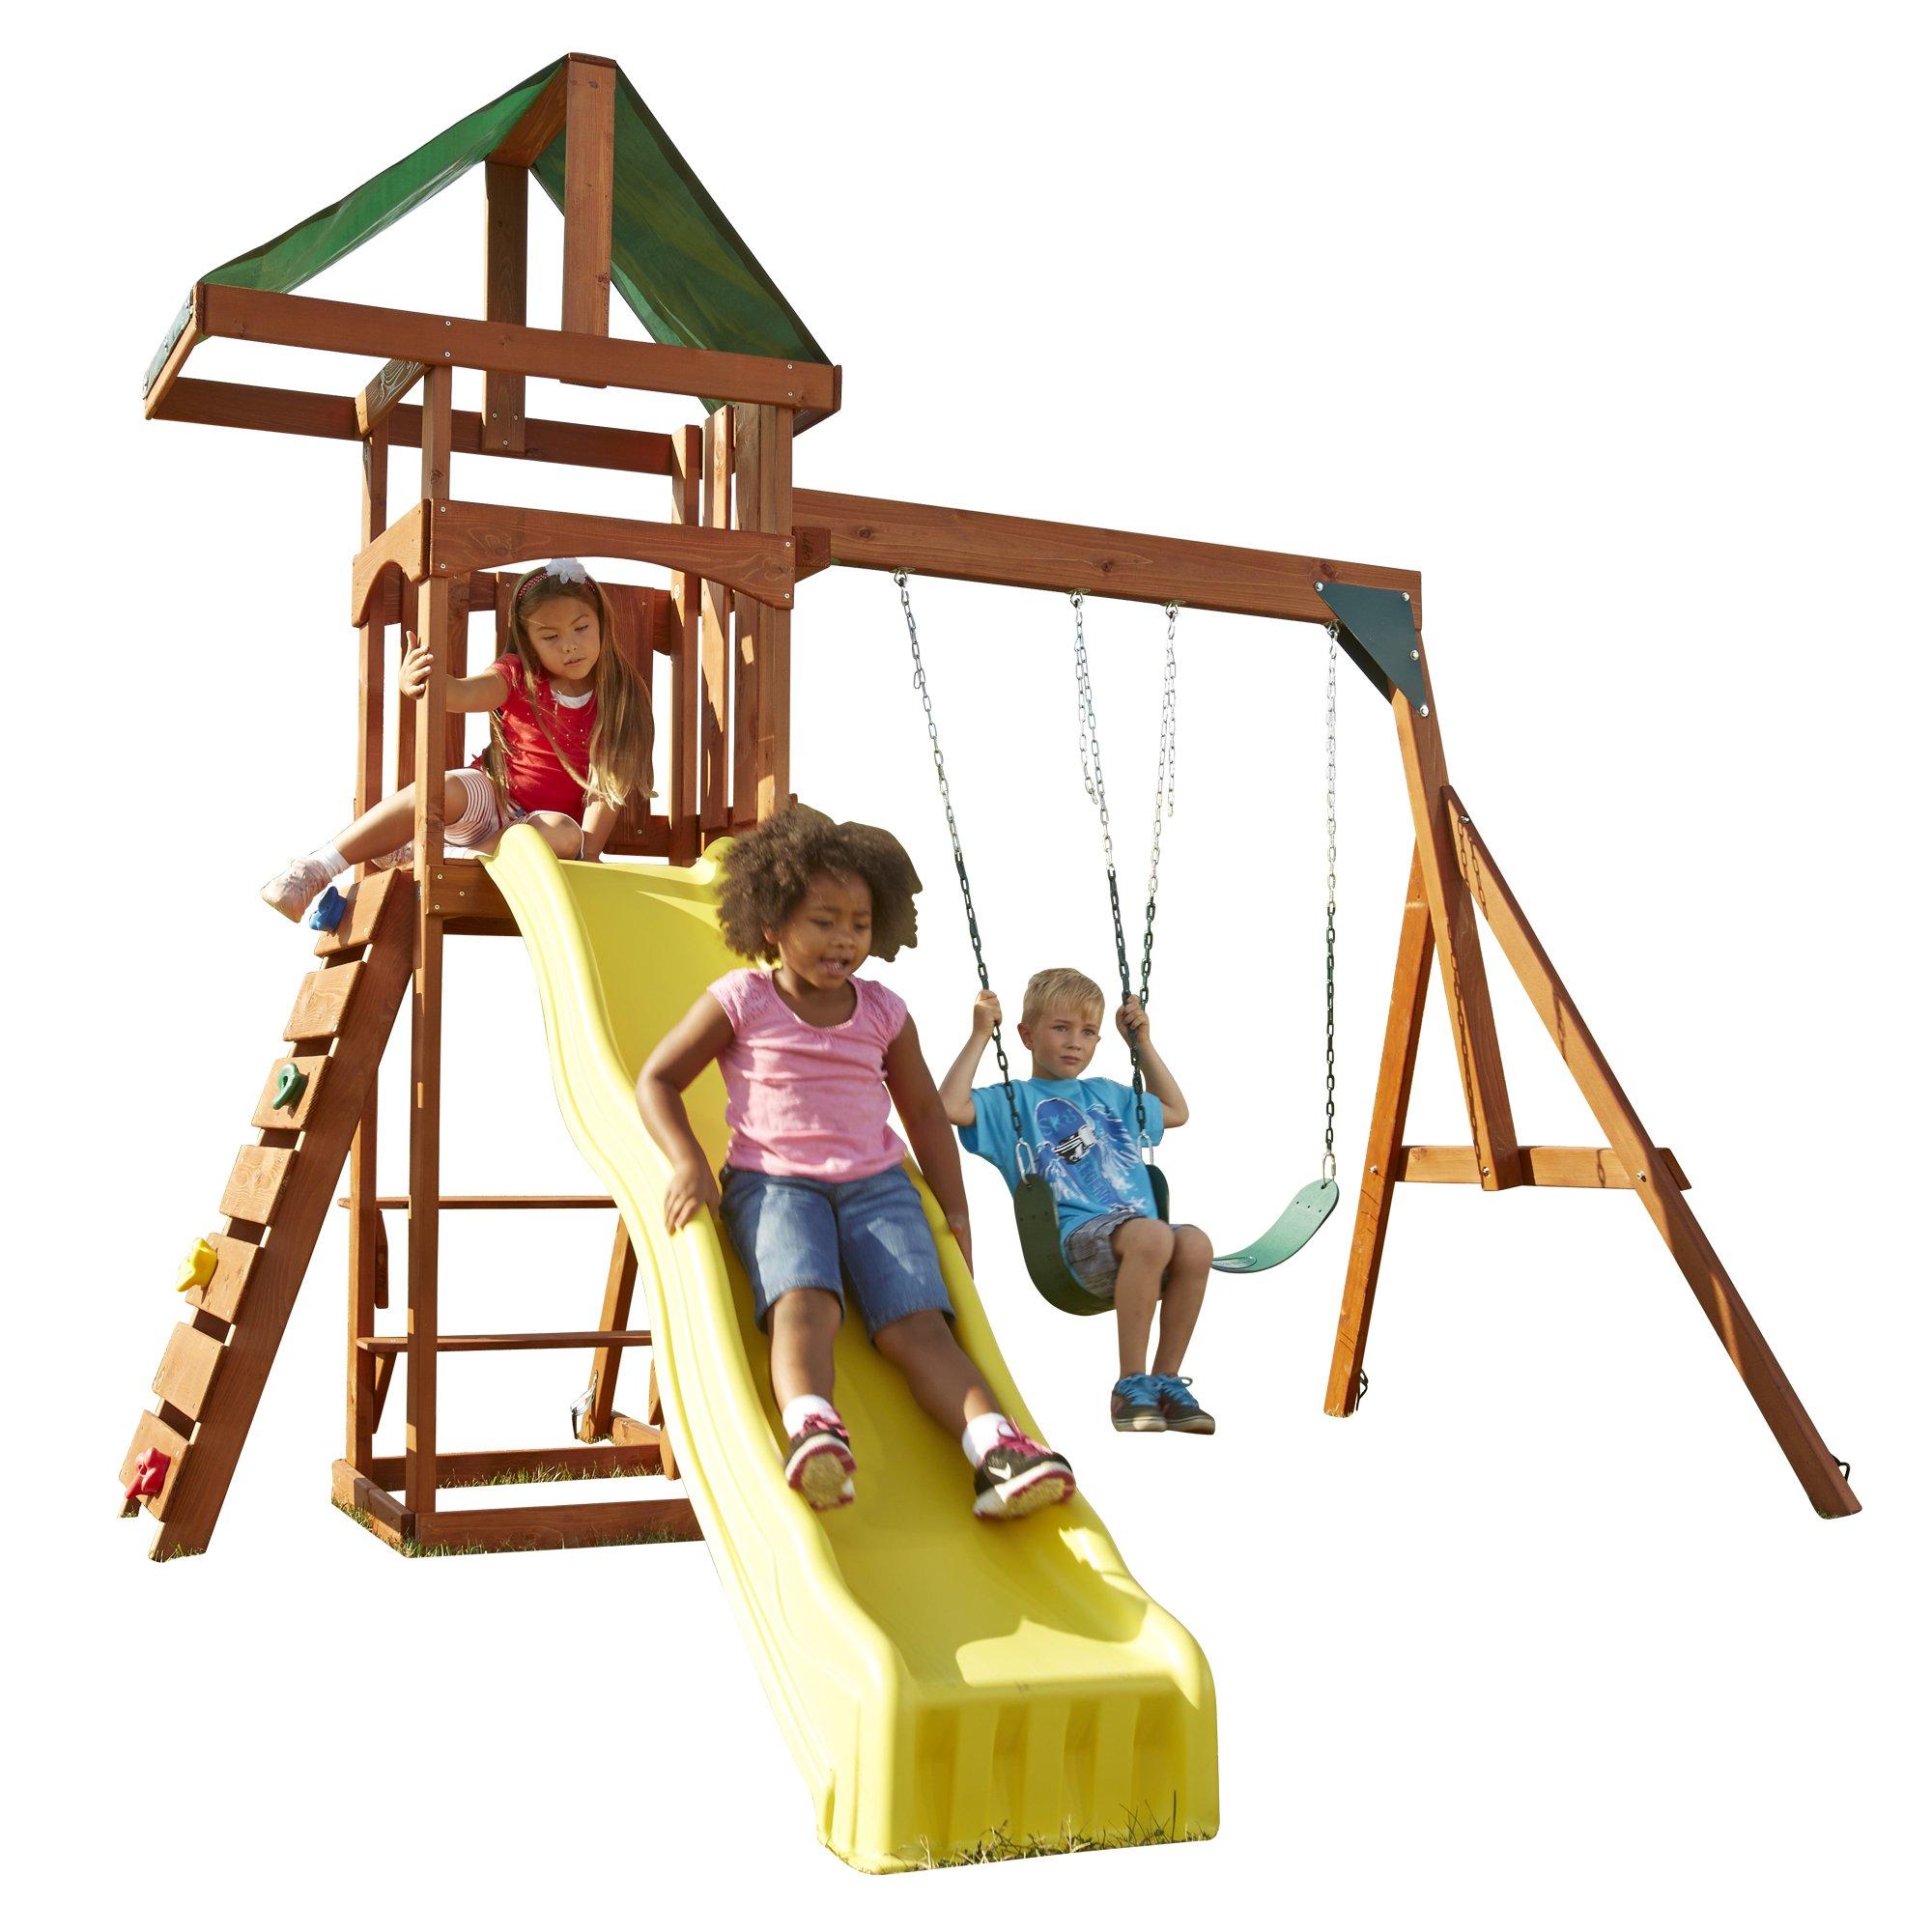 Small Backyard Swing Set Wooden Outdoor Playground Playset ...